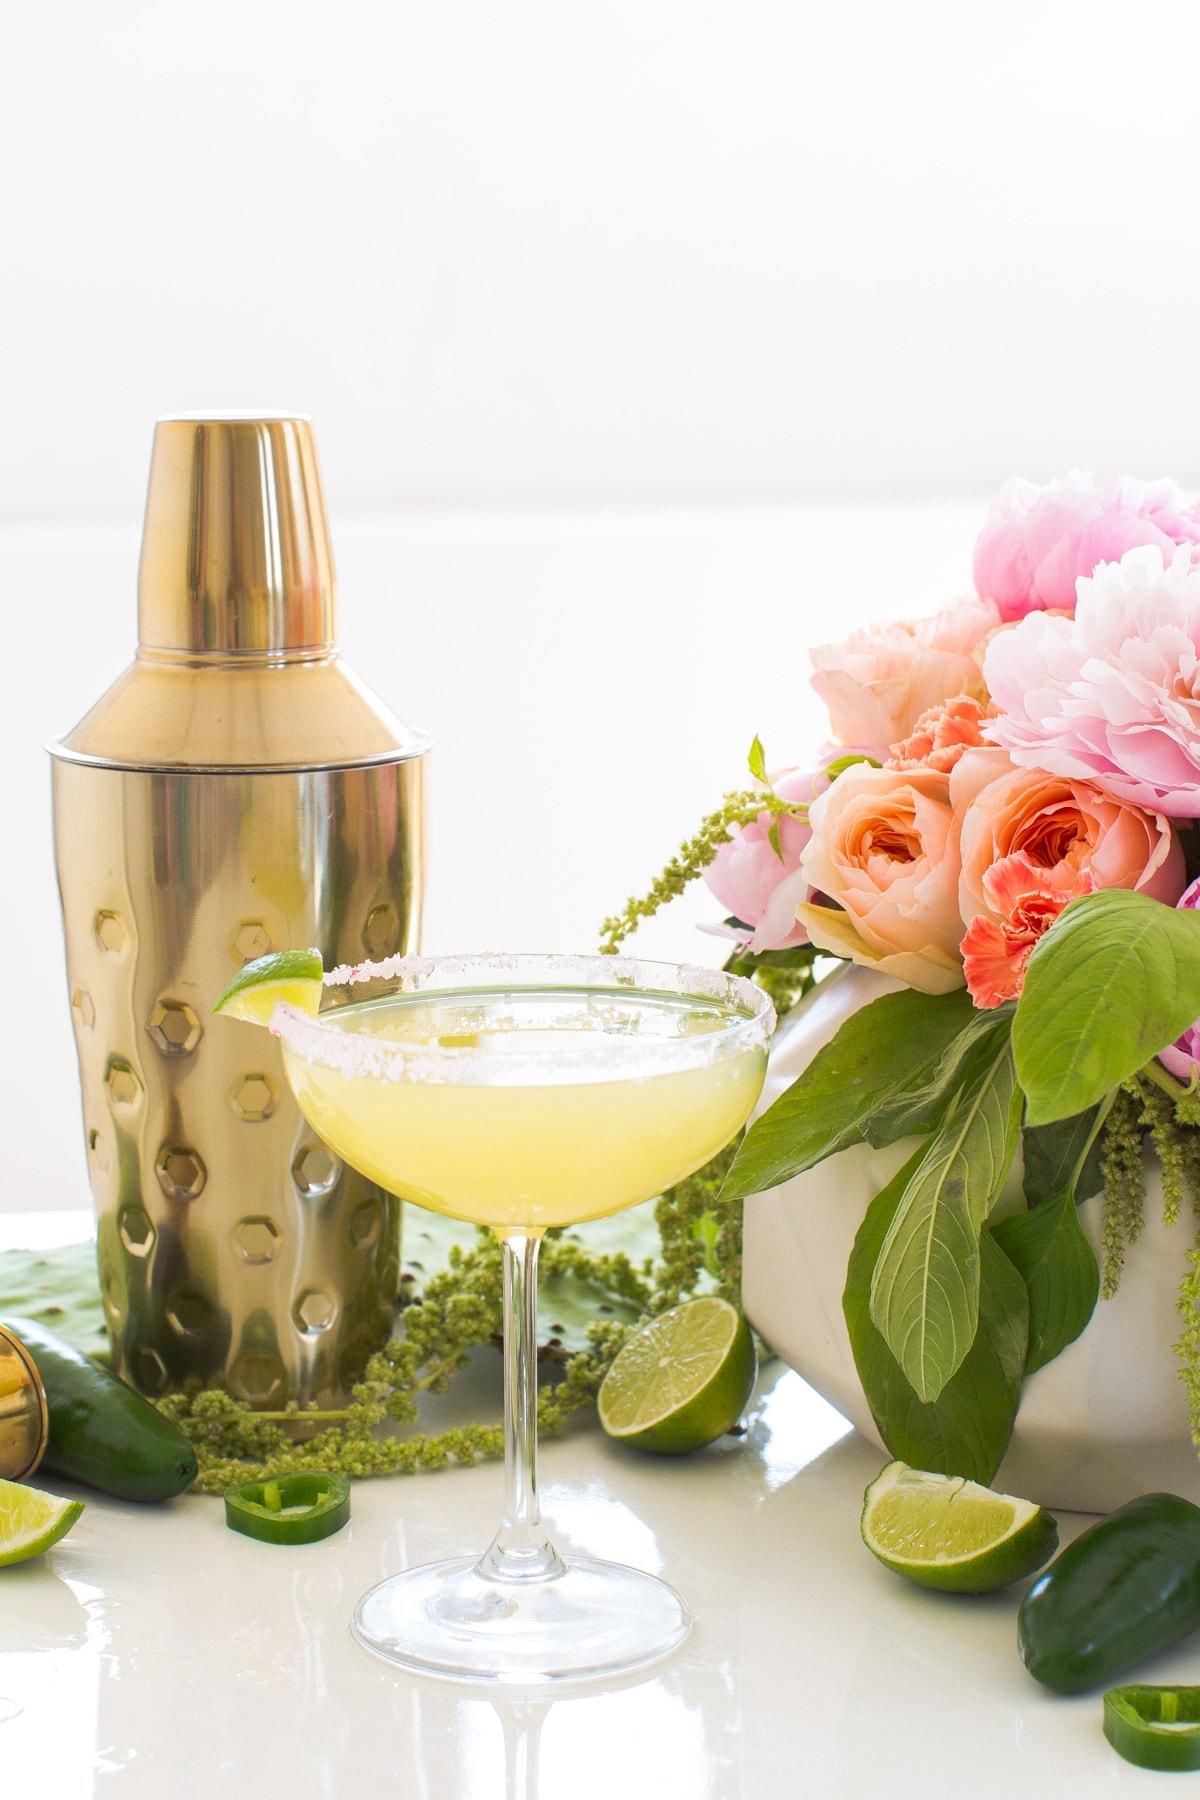 Jalapeño margarita - A Skinny Jalapeno Margarita recipe for Cinco de Mayo by top Houston lifestyle blogger Ashley Rose of Sugar & Cloth